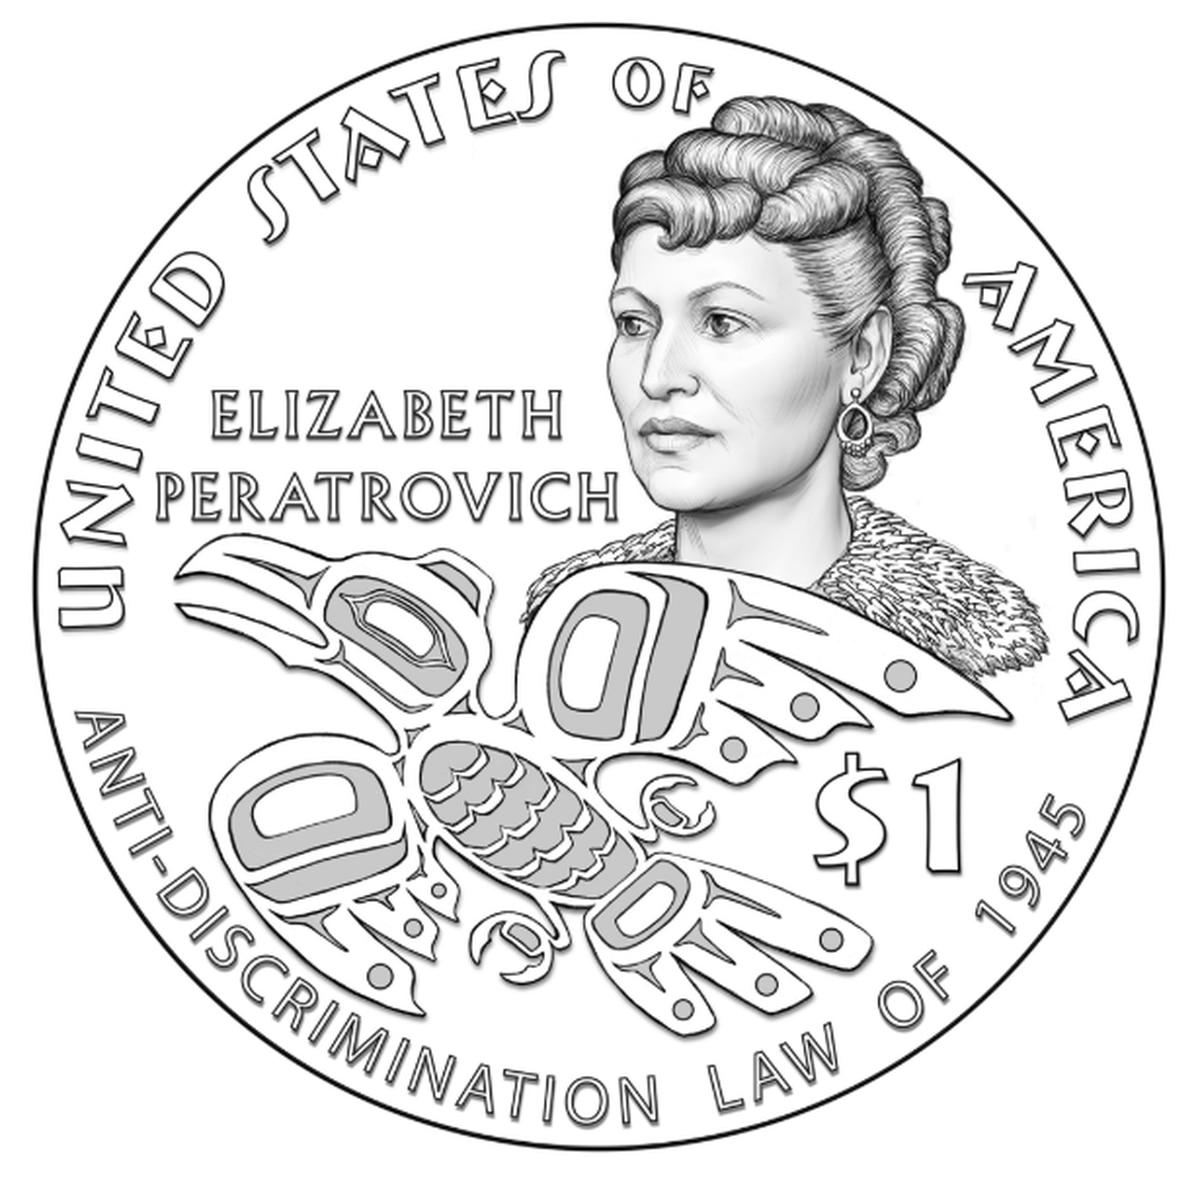 Alaska Native leader Elizabeth Peratrovich commemorated on $1 coin